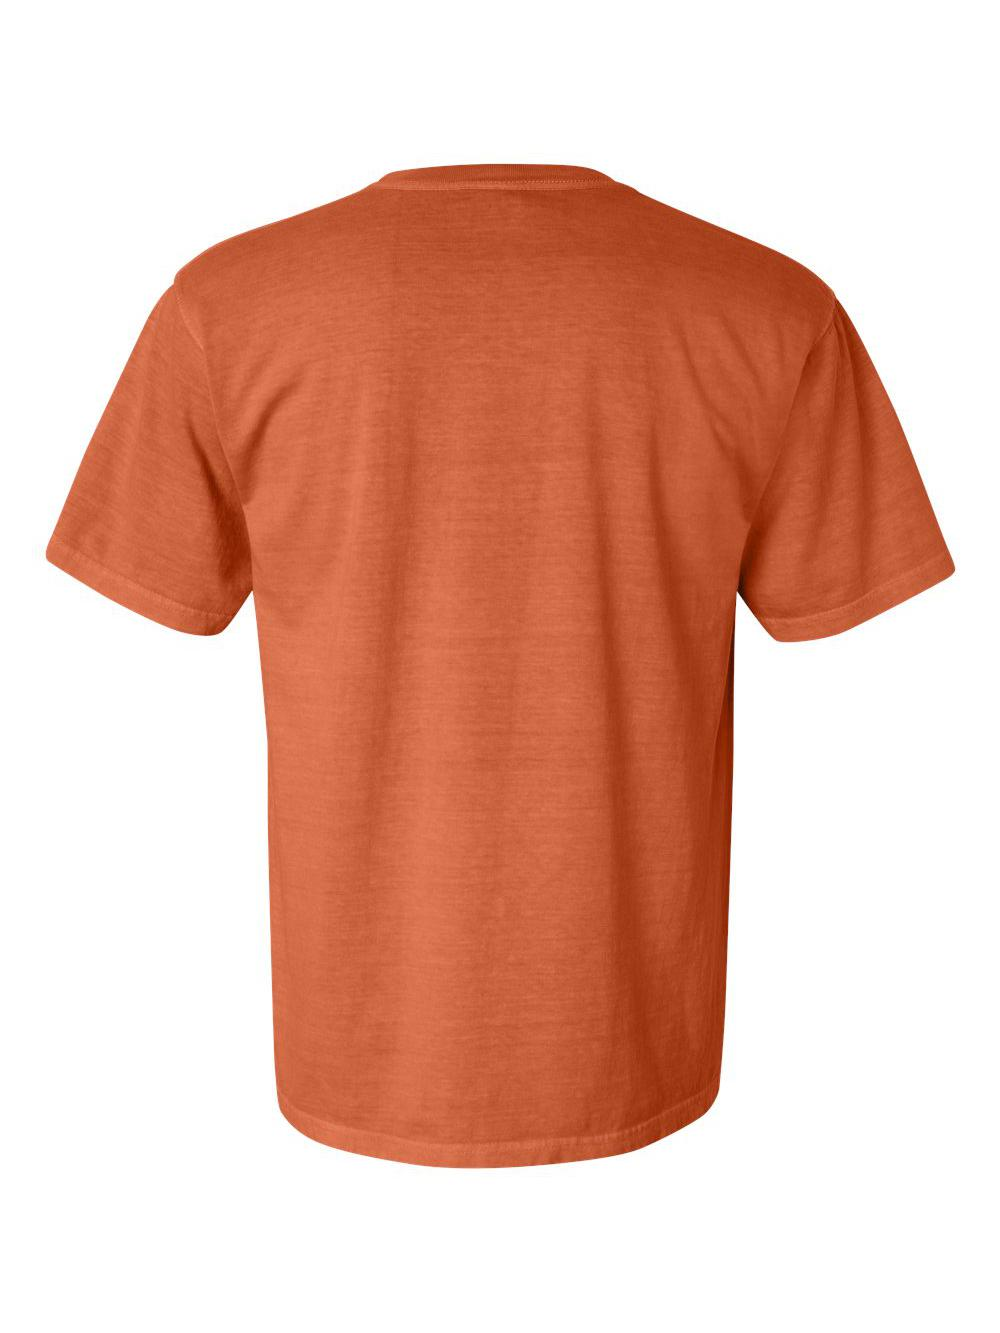 Comfort-Colors-Garment-Dyed-Heavyweight-Ringspun-Short-Sleeve-Shirt-1717 thumbnail 25